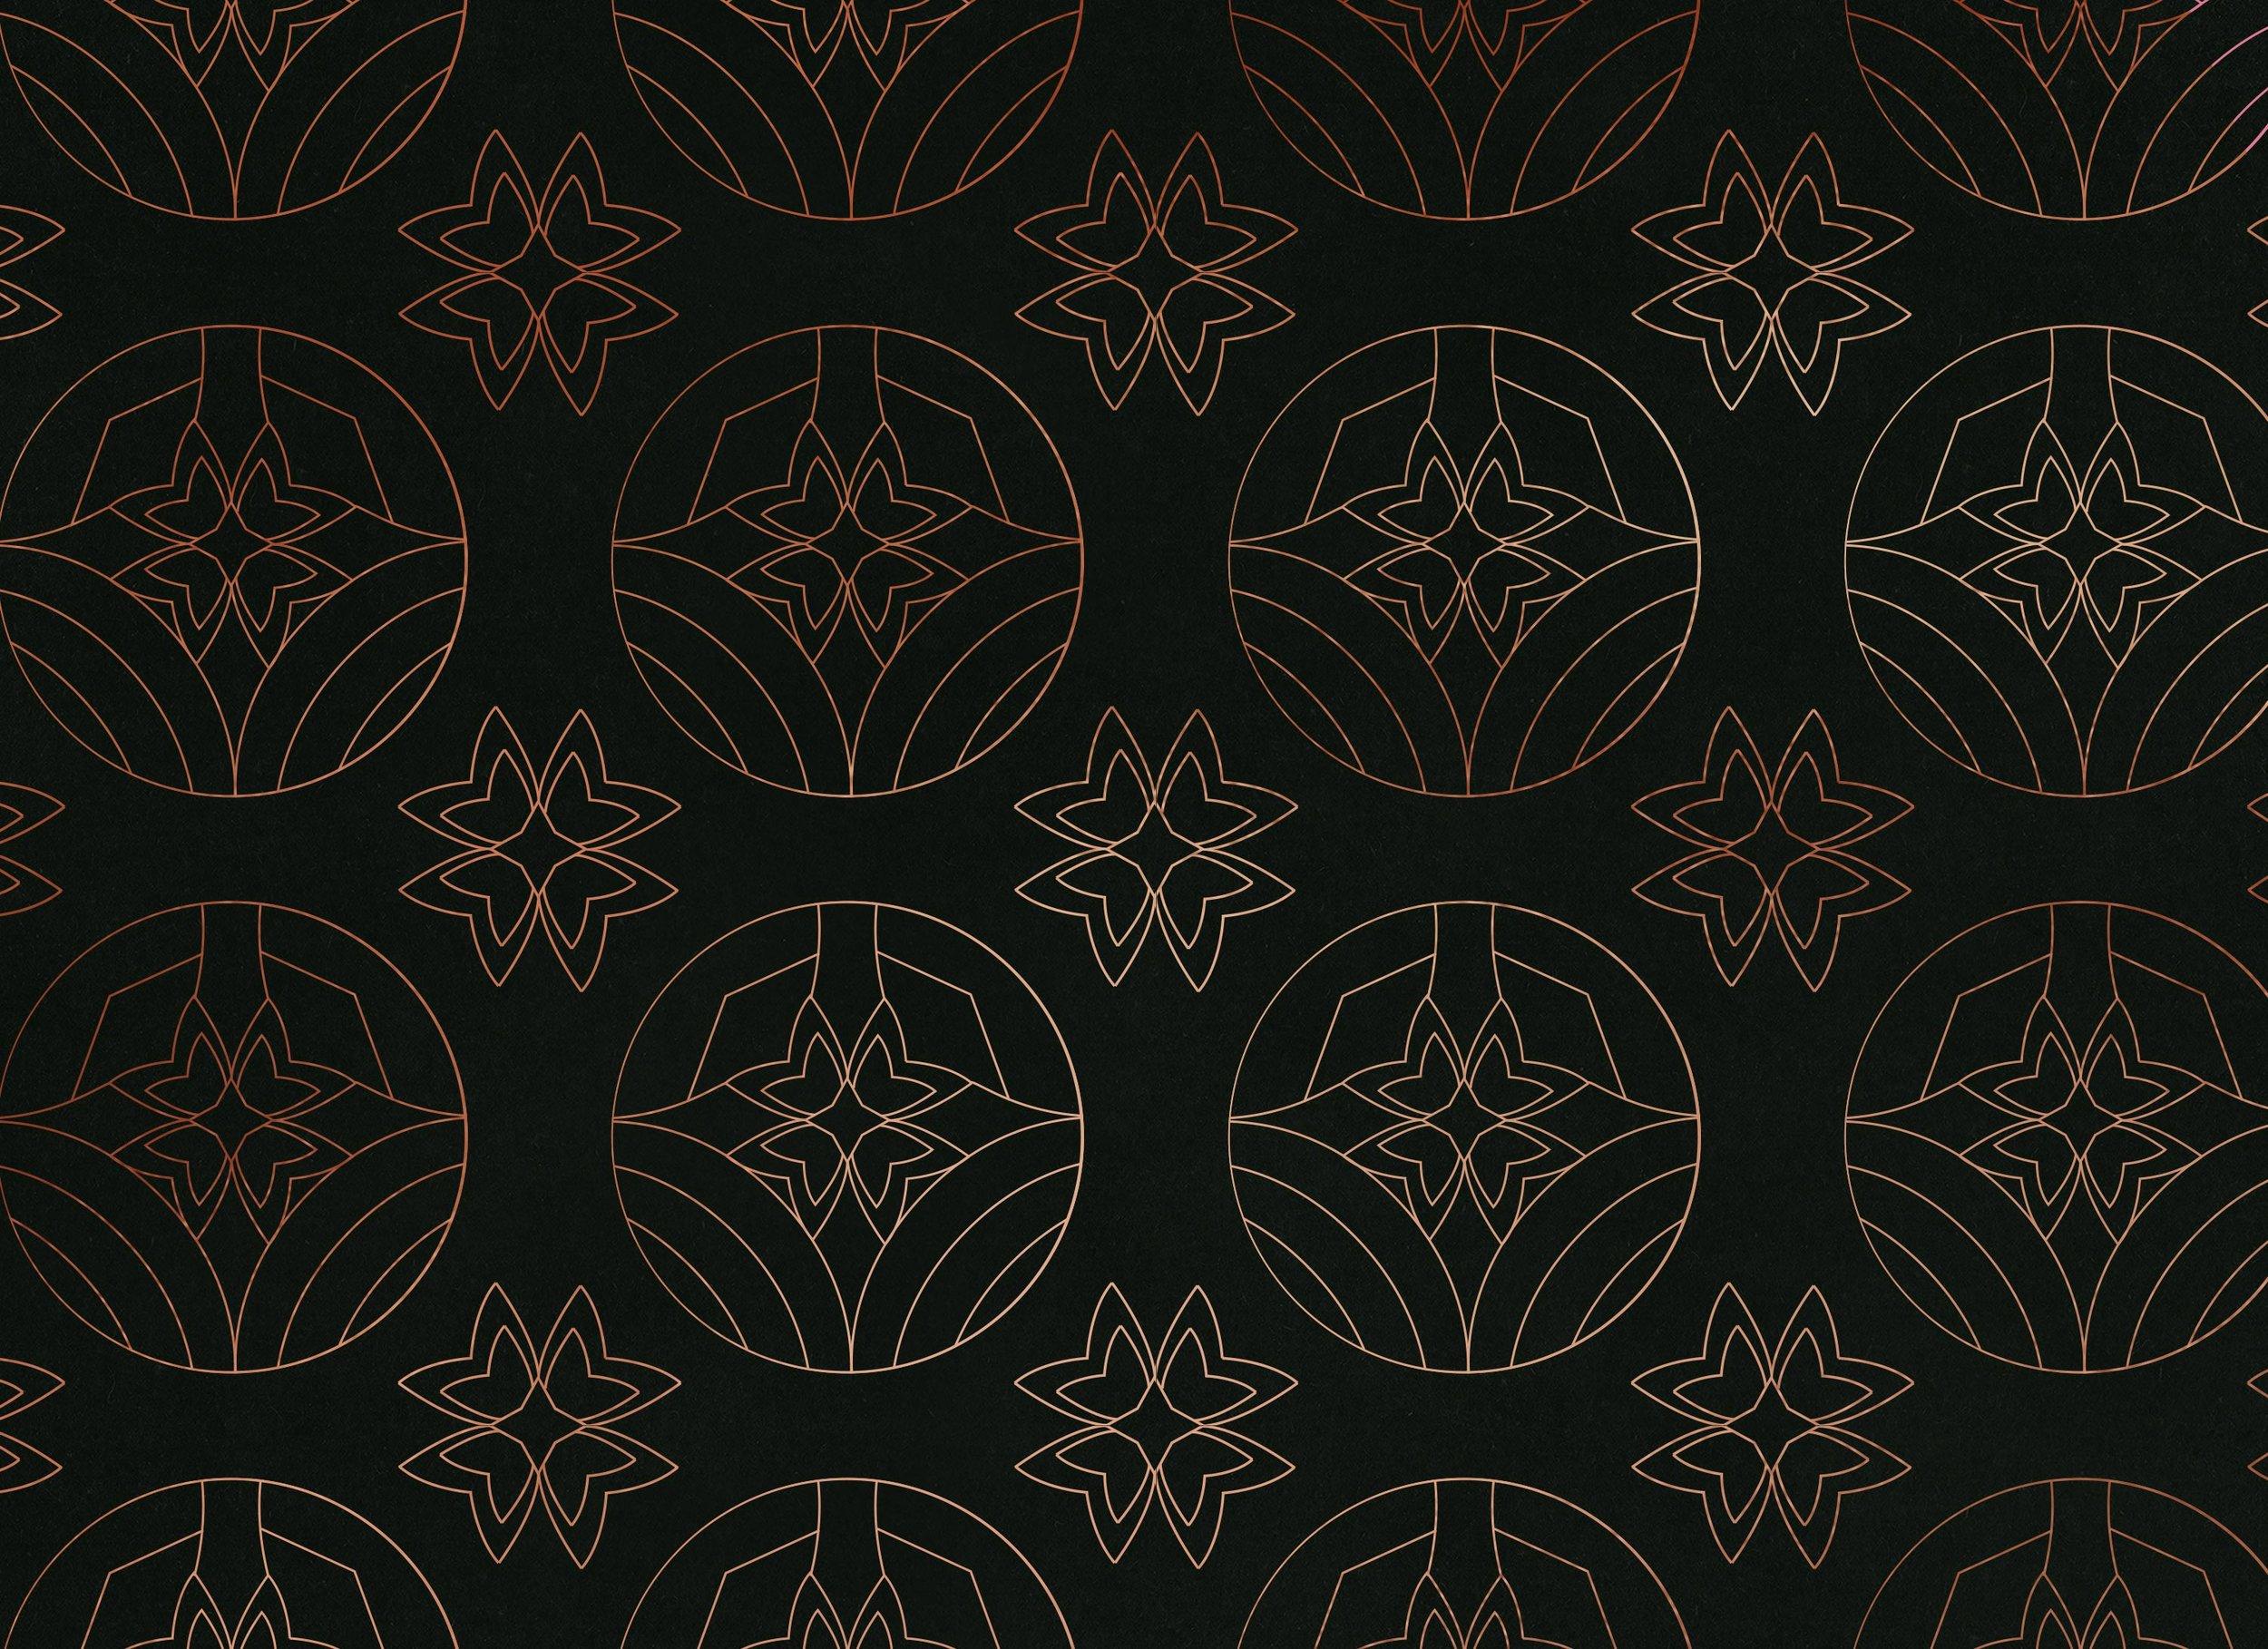 pattern-gold-foil.jpg